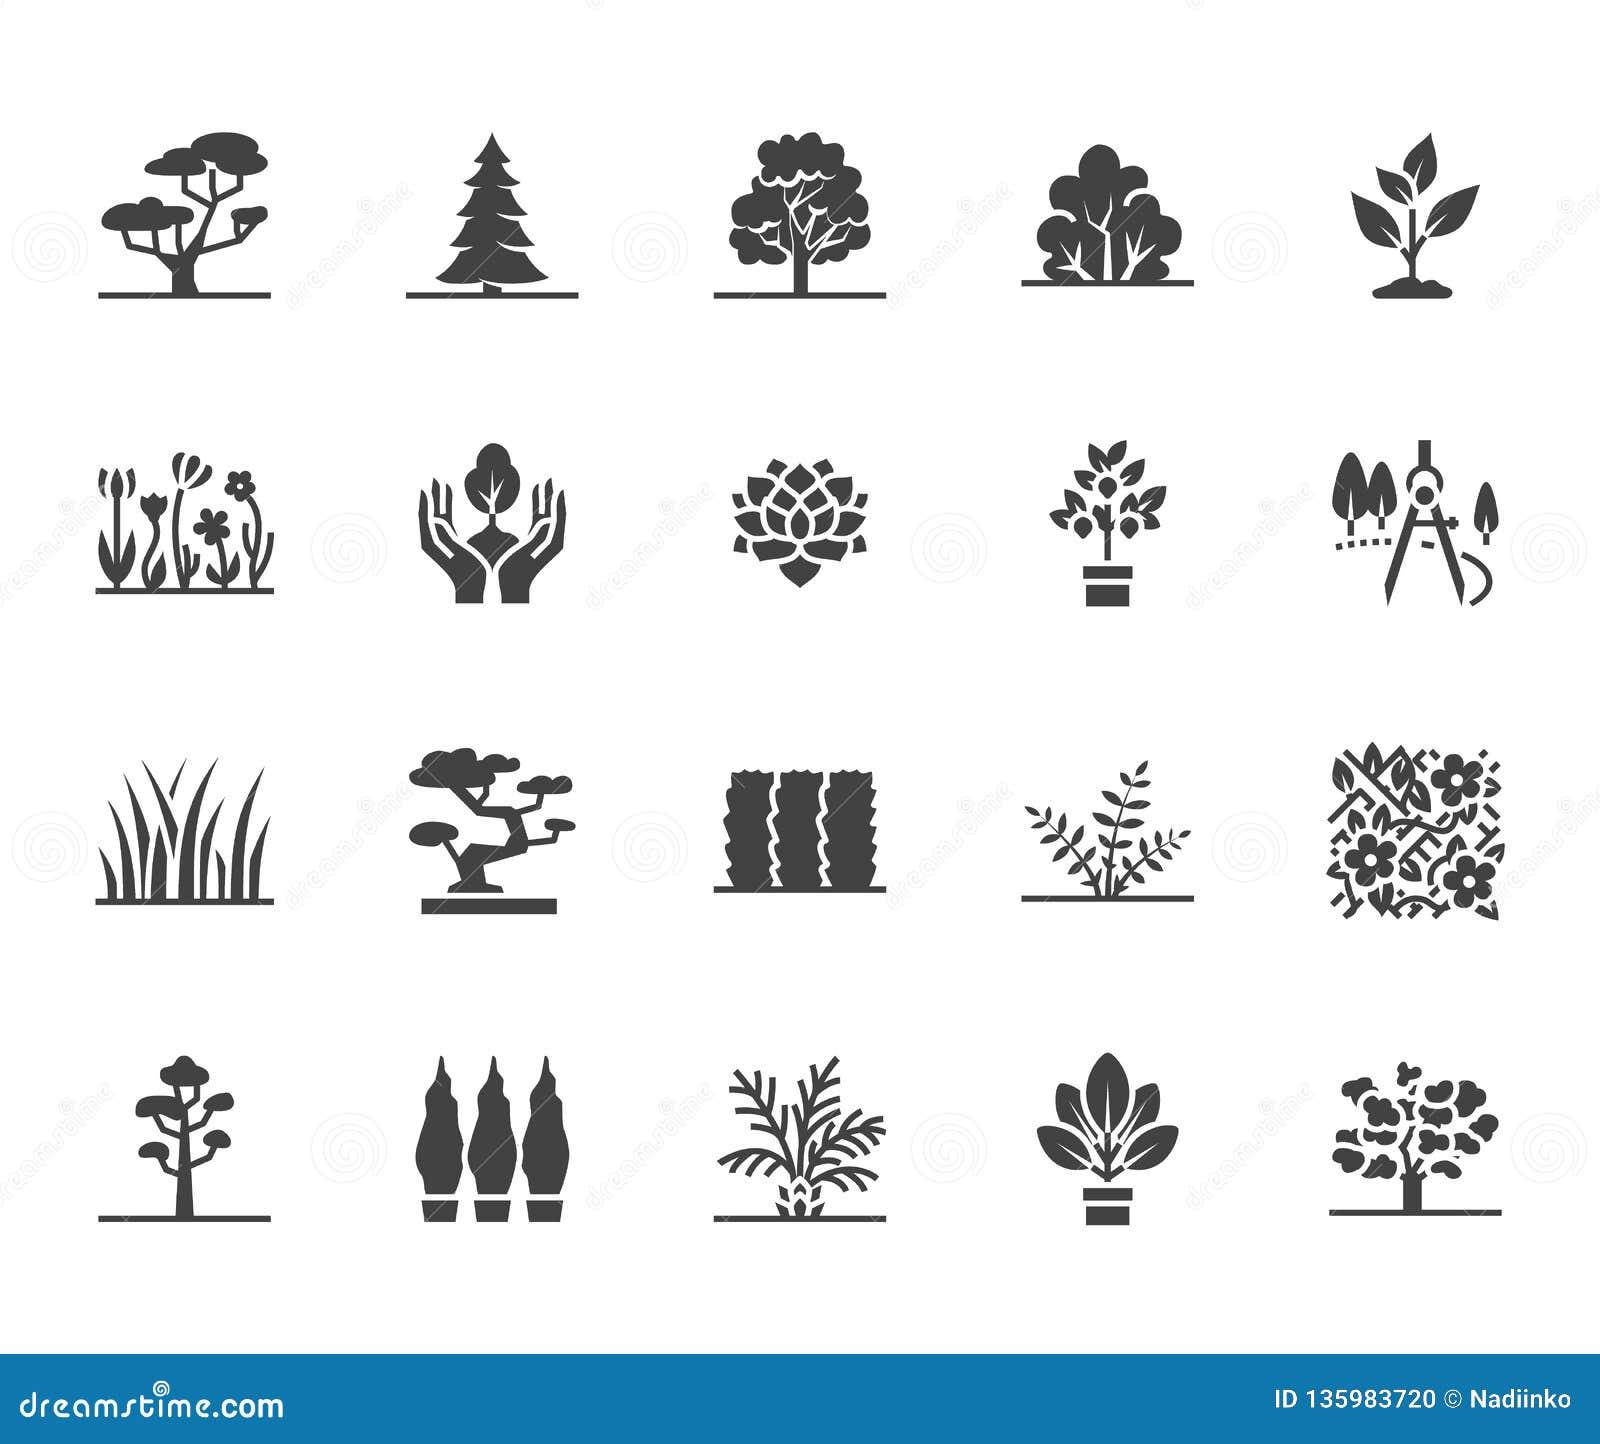 Trees flat glyph icons set. Plants, landscape design, fir tree, succulent, privacy shrub, lawn grass, flowers vector